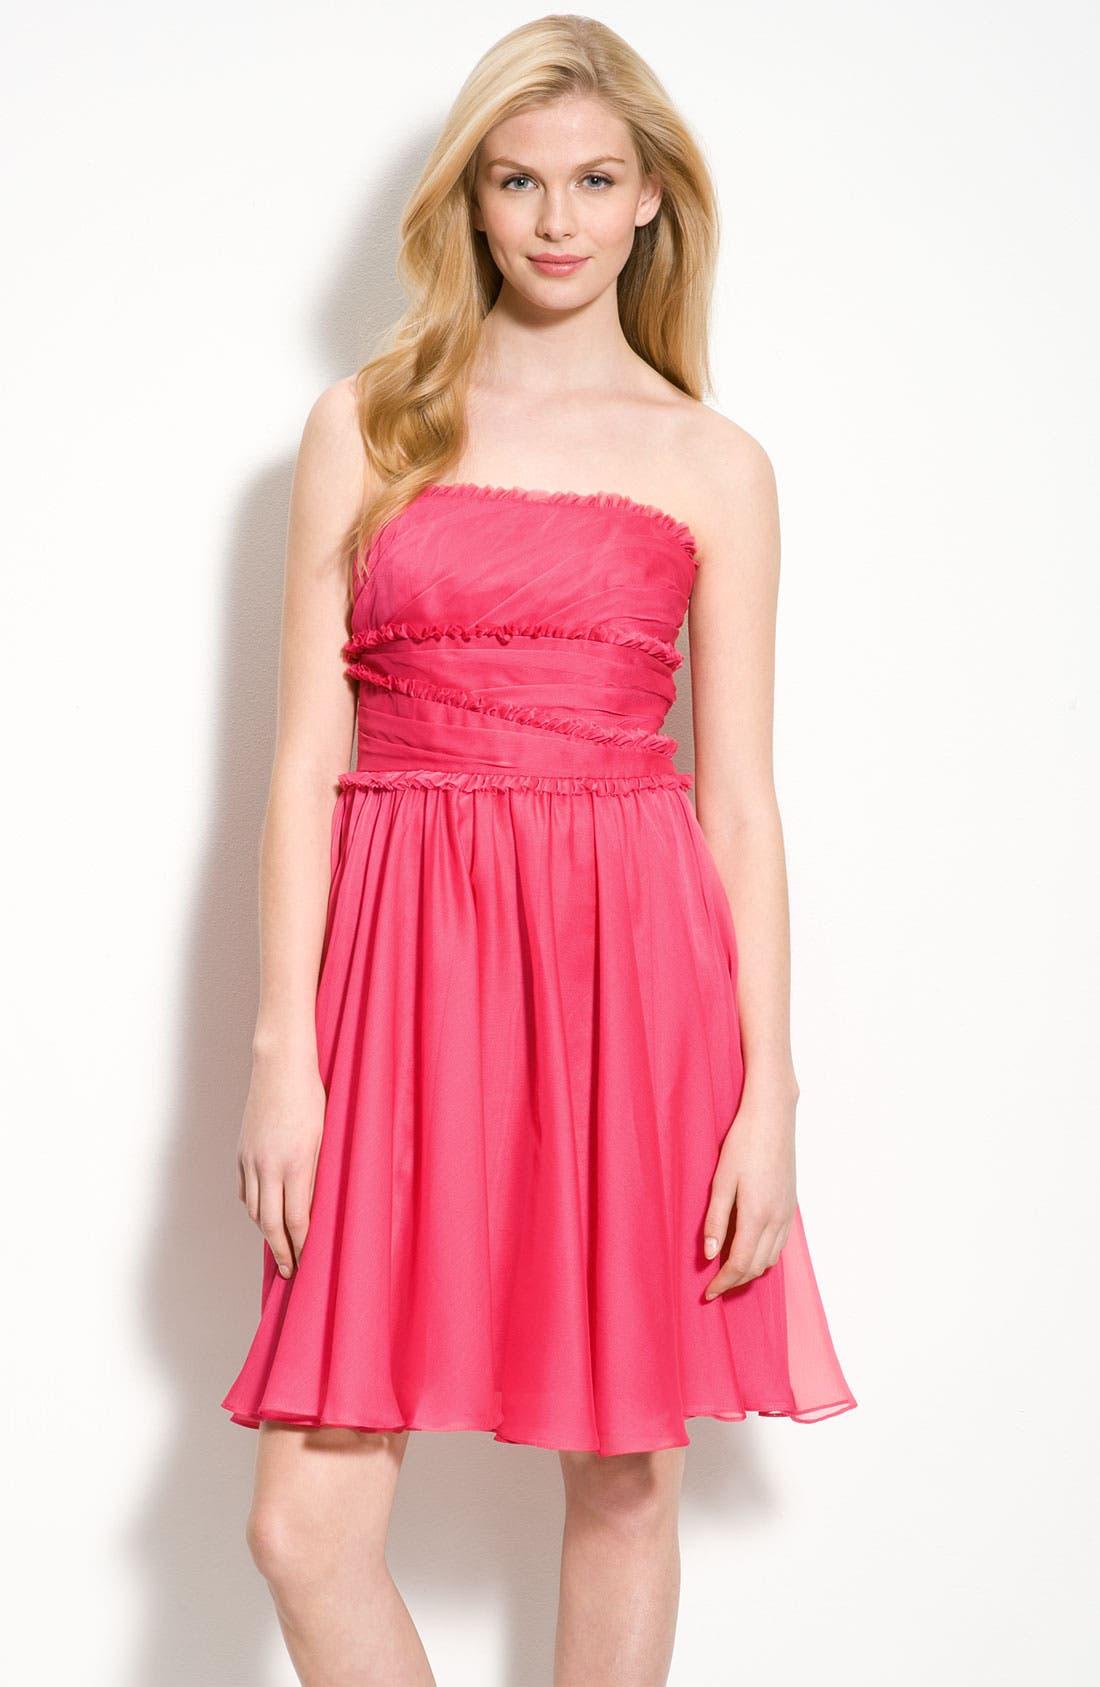 Main Image - ML Monique Lhuillier Bridesmaids Ruffle Chiffon Dress (Nordstrom Exclusive)